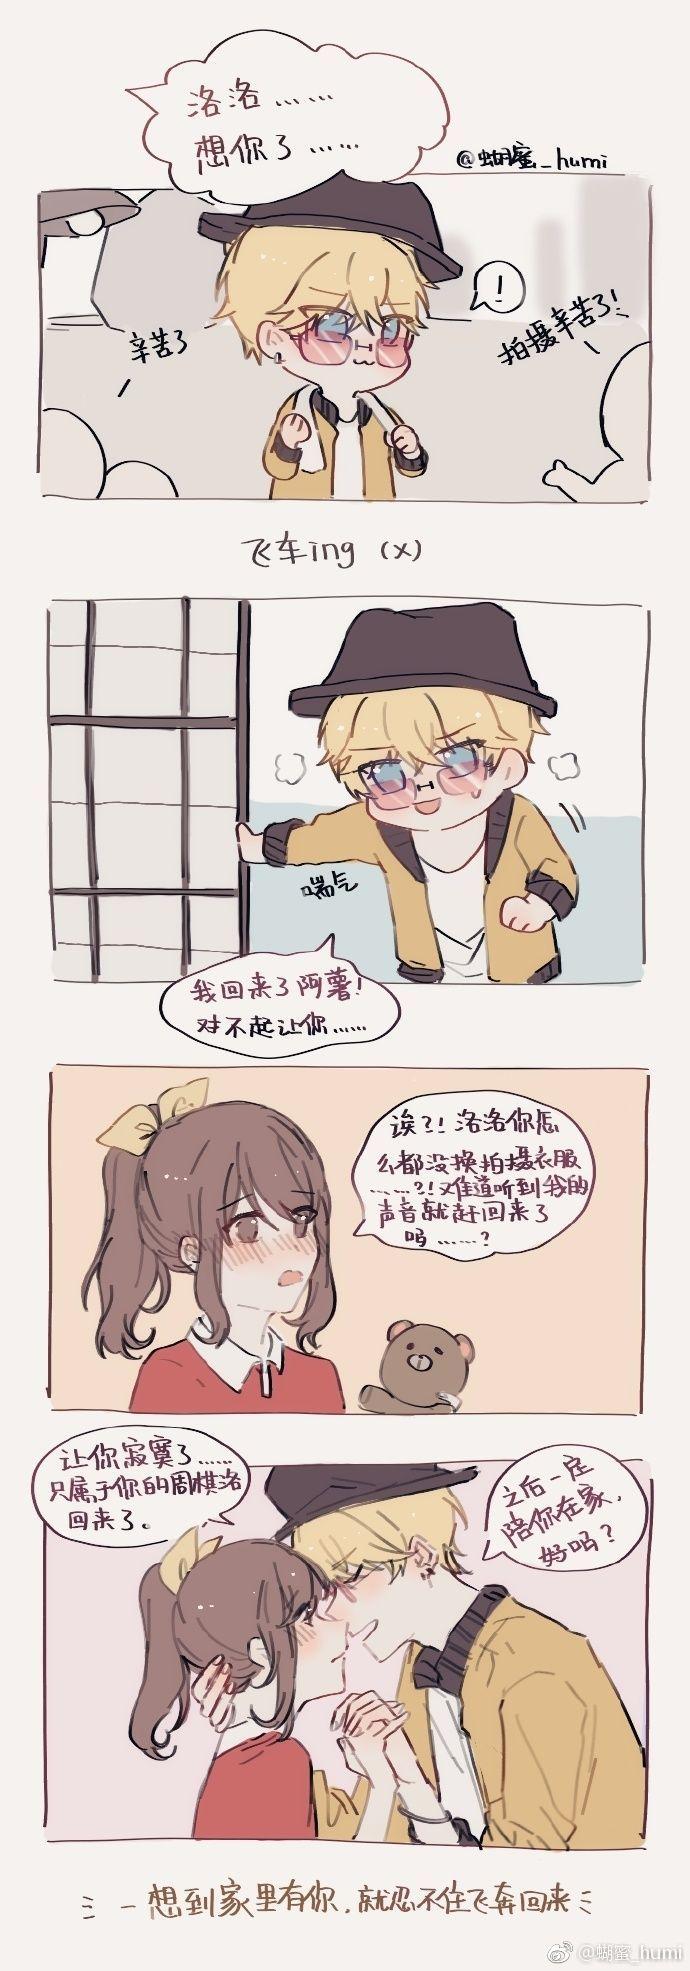 Pin on QiLuo♡주기락♡キラ♡棋洛♡4/9♥︎